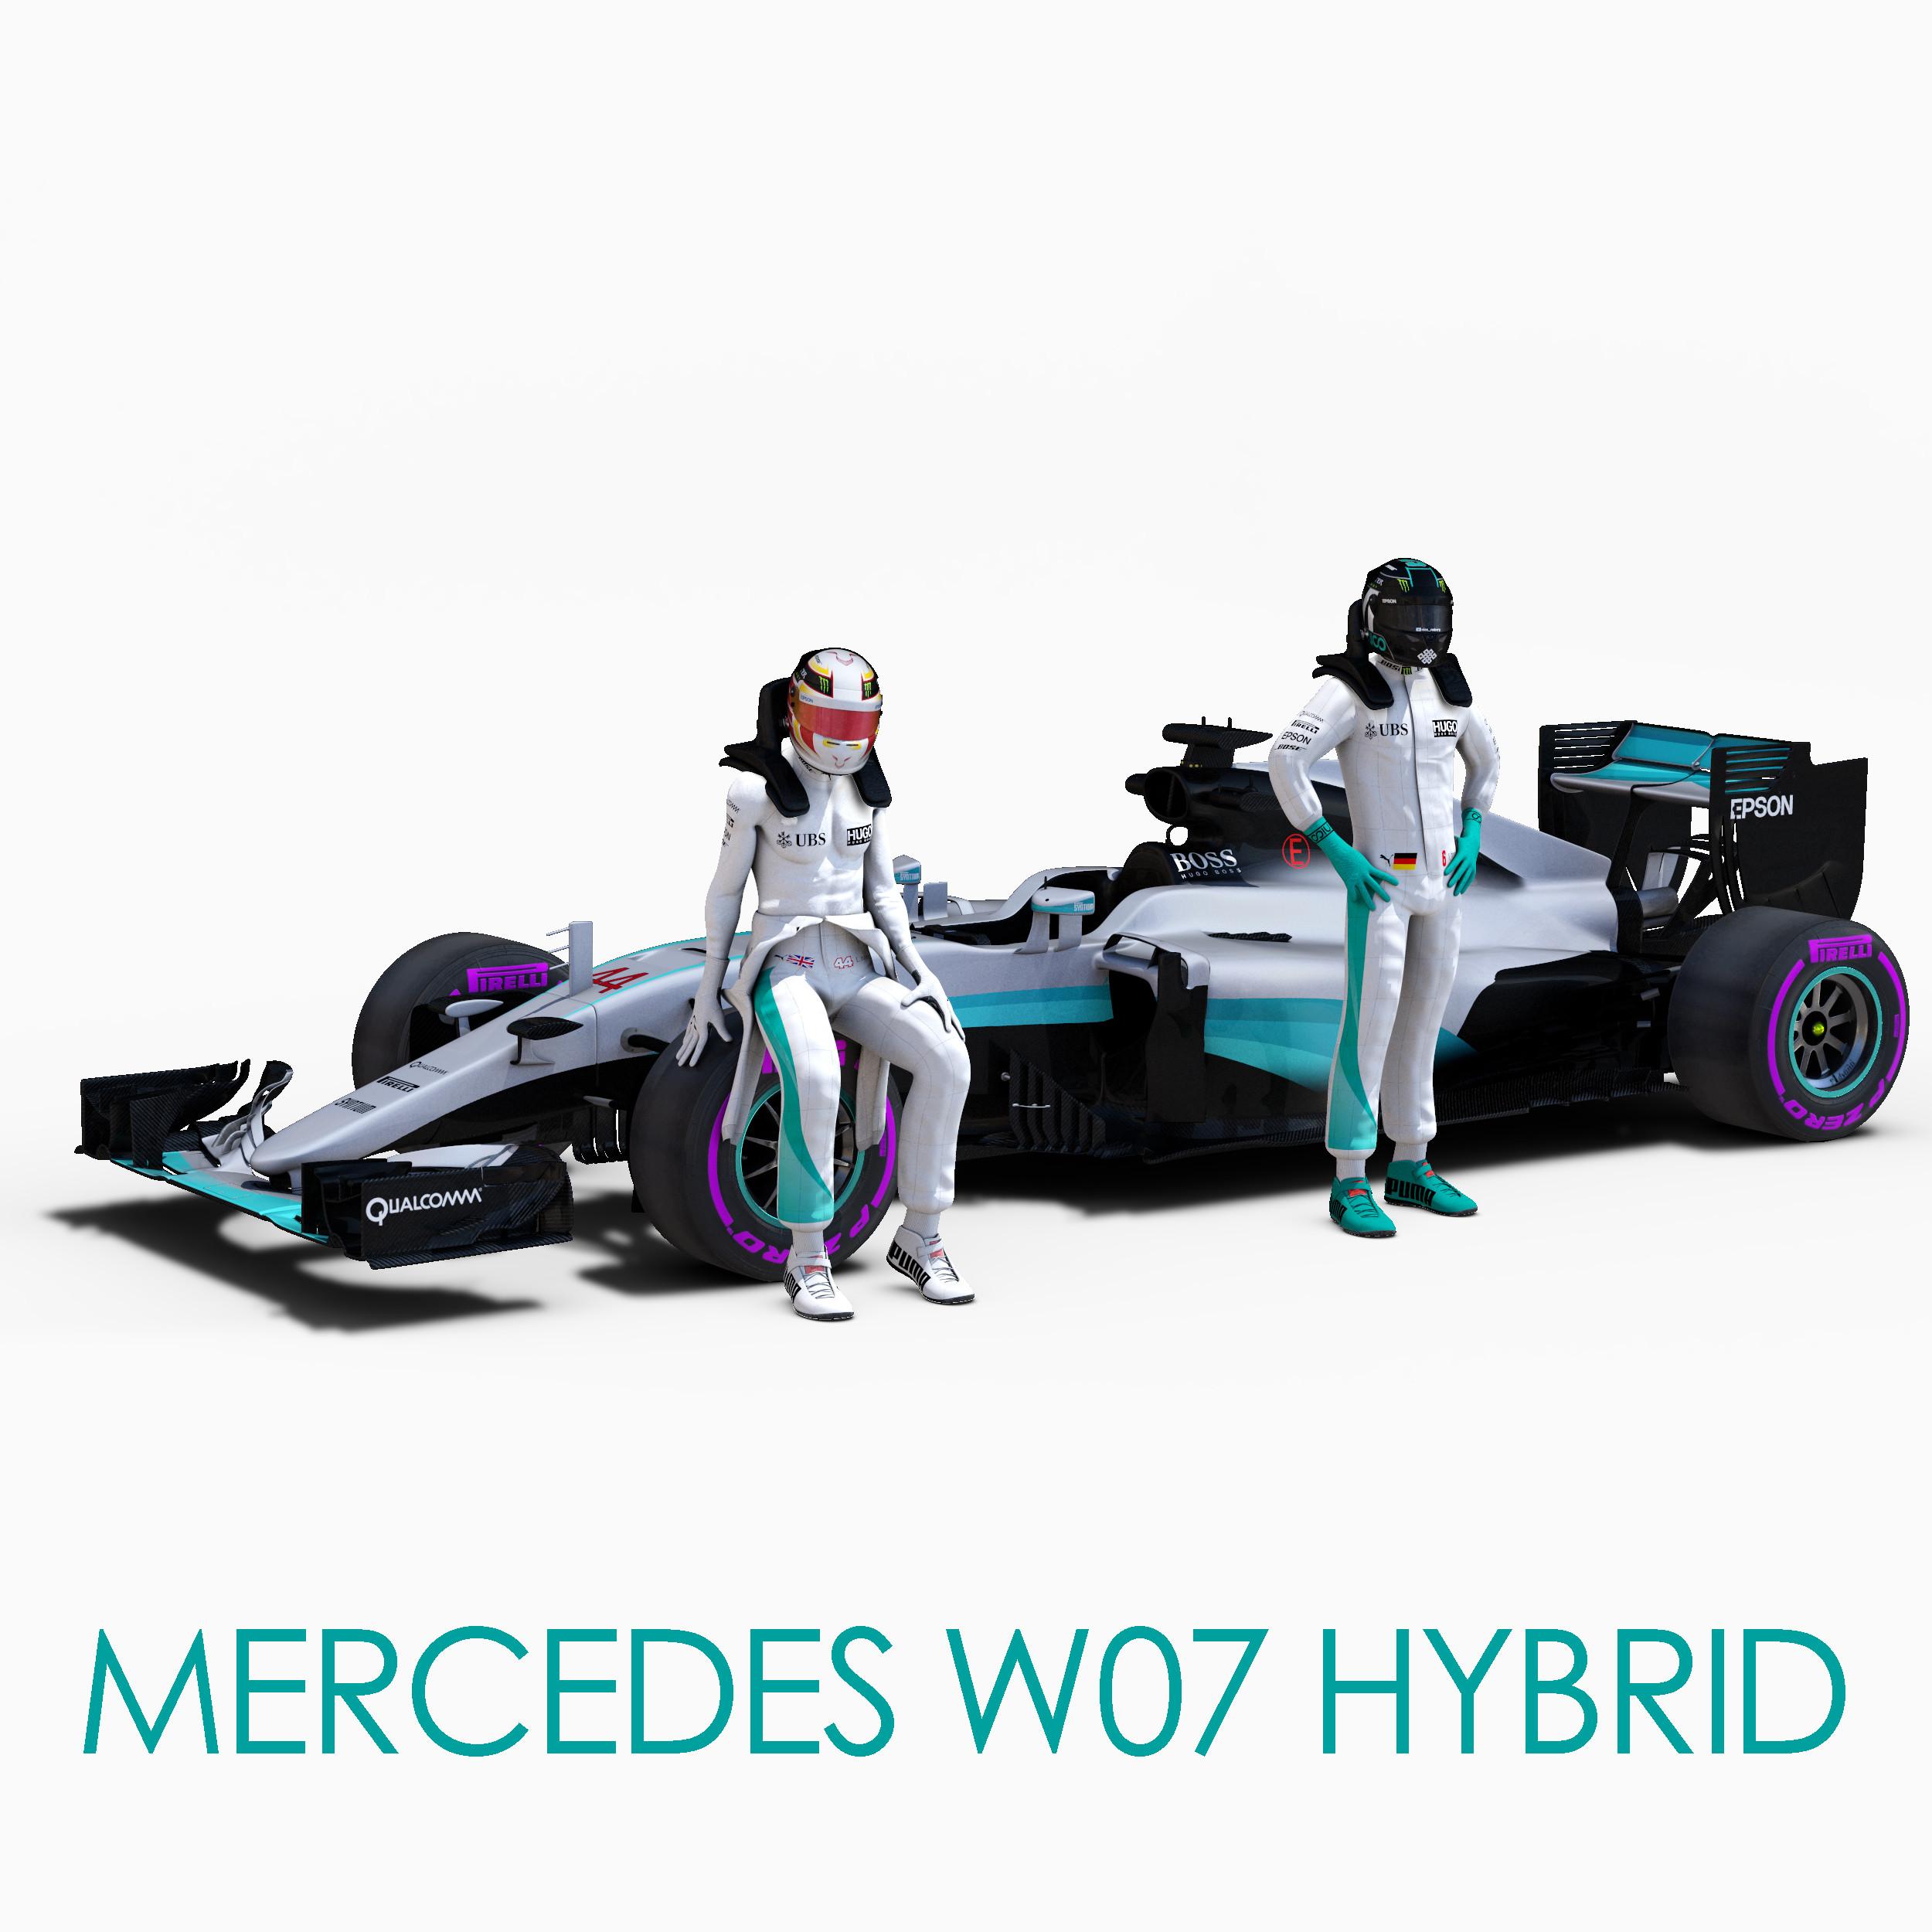 Mercedes_W07_01.jpg